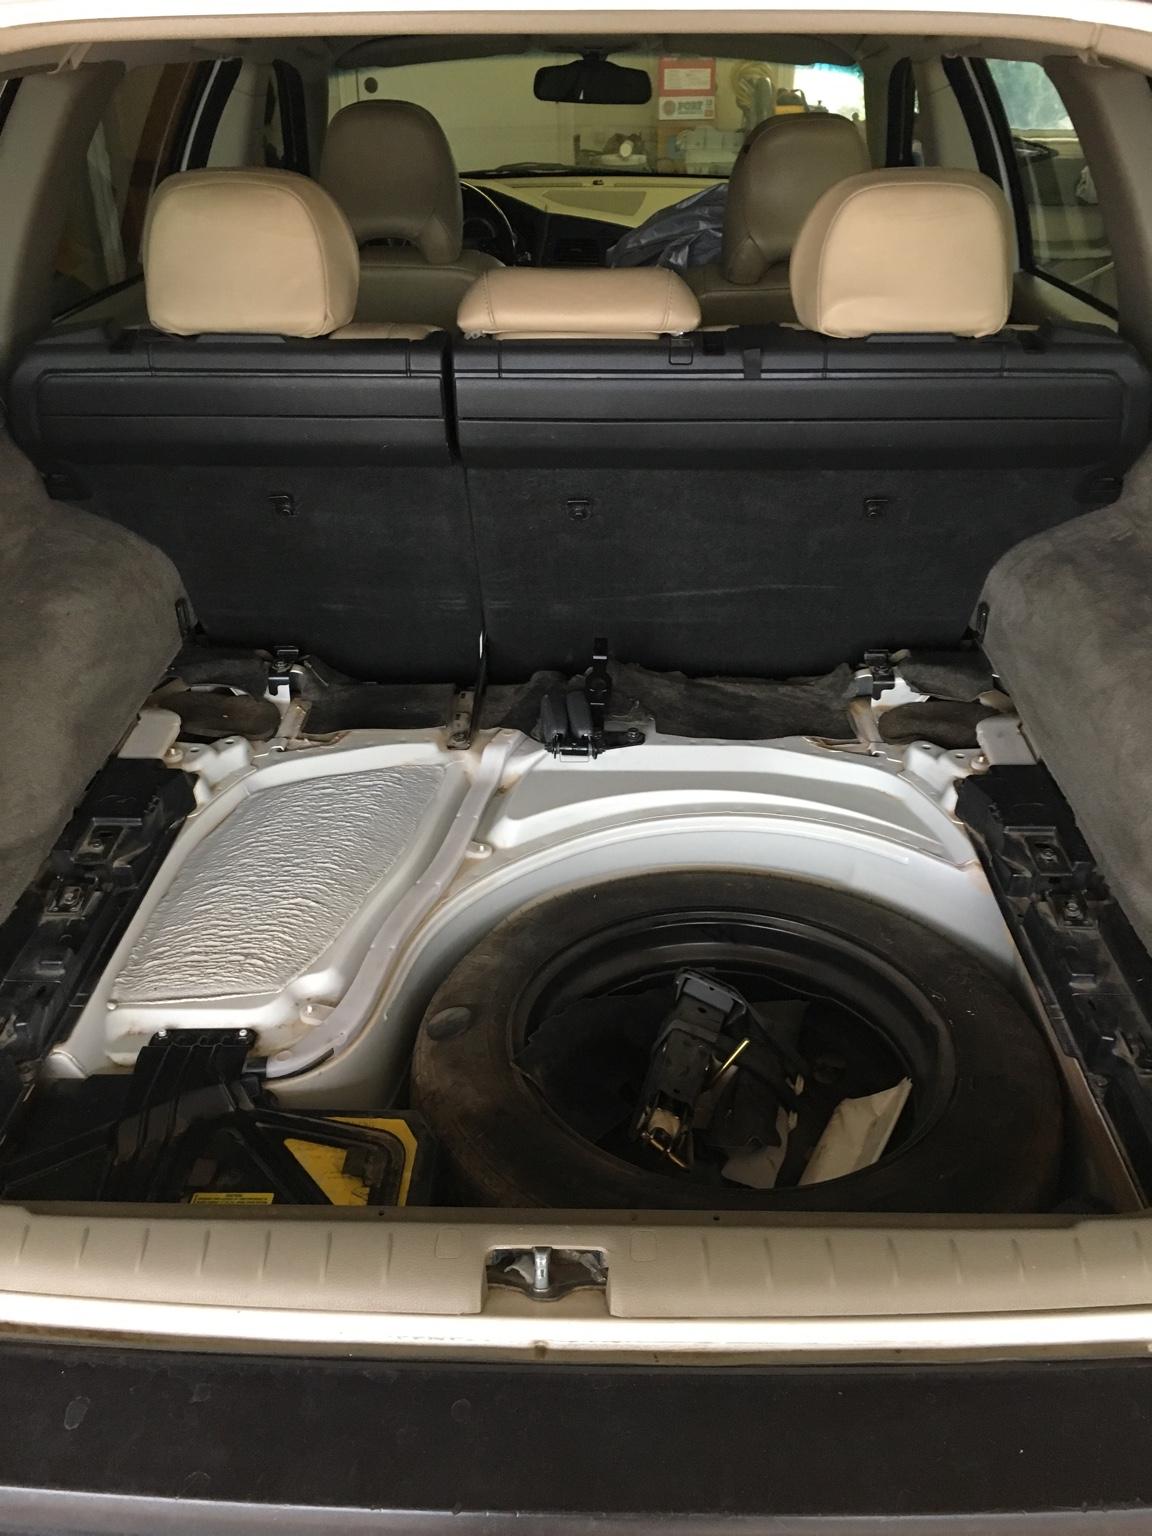 Volvo Xc70 3rd Row Seat Installation Brokeasshome Com